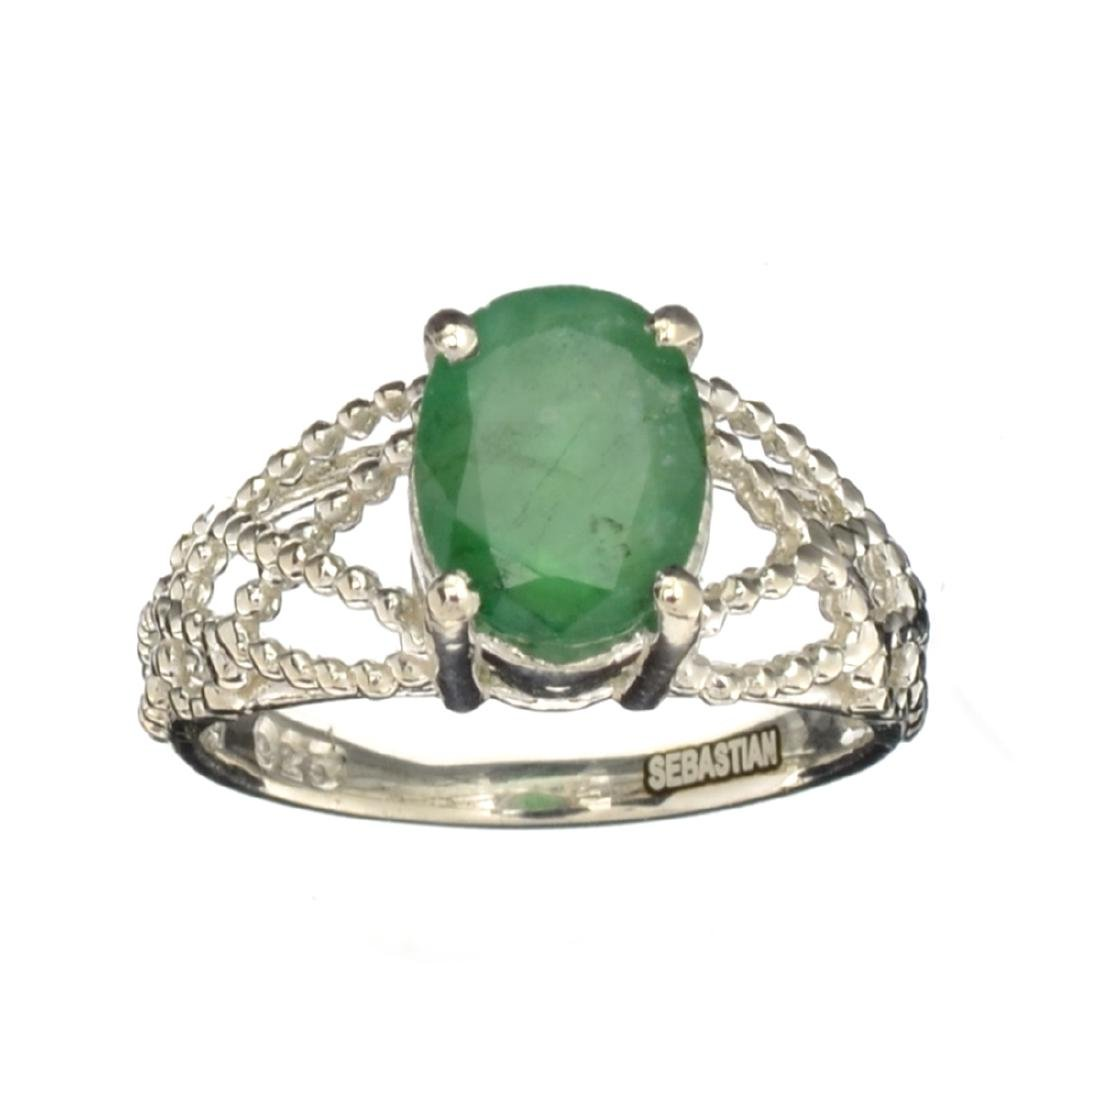 APP: 0.5k Fine Jewelry Designer Sebastian, 1.75CT Oval